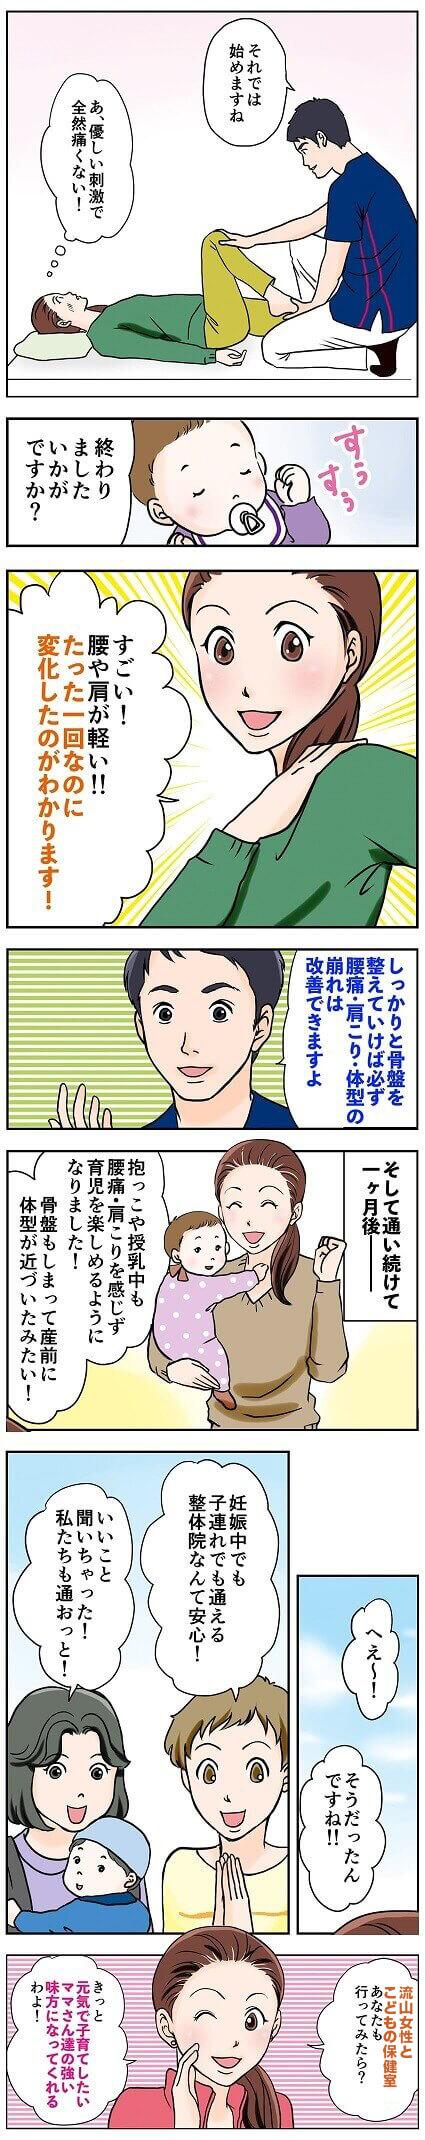 SPマンガページ4